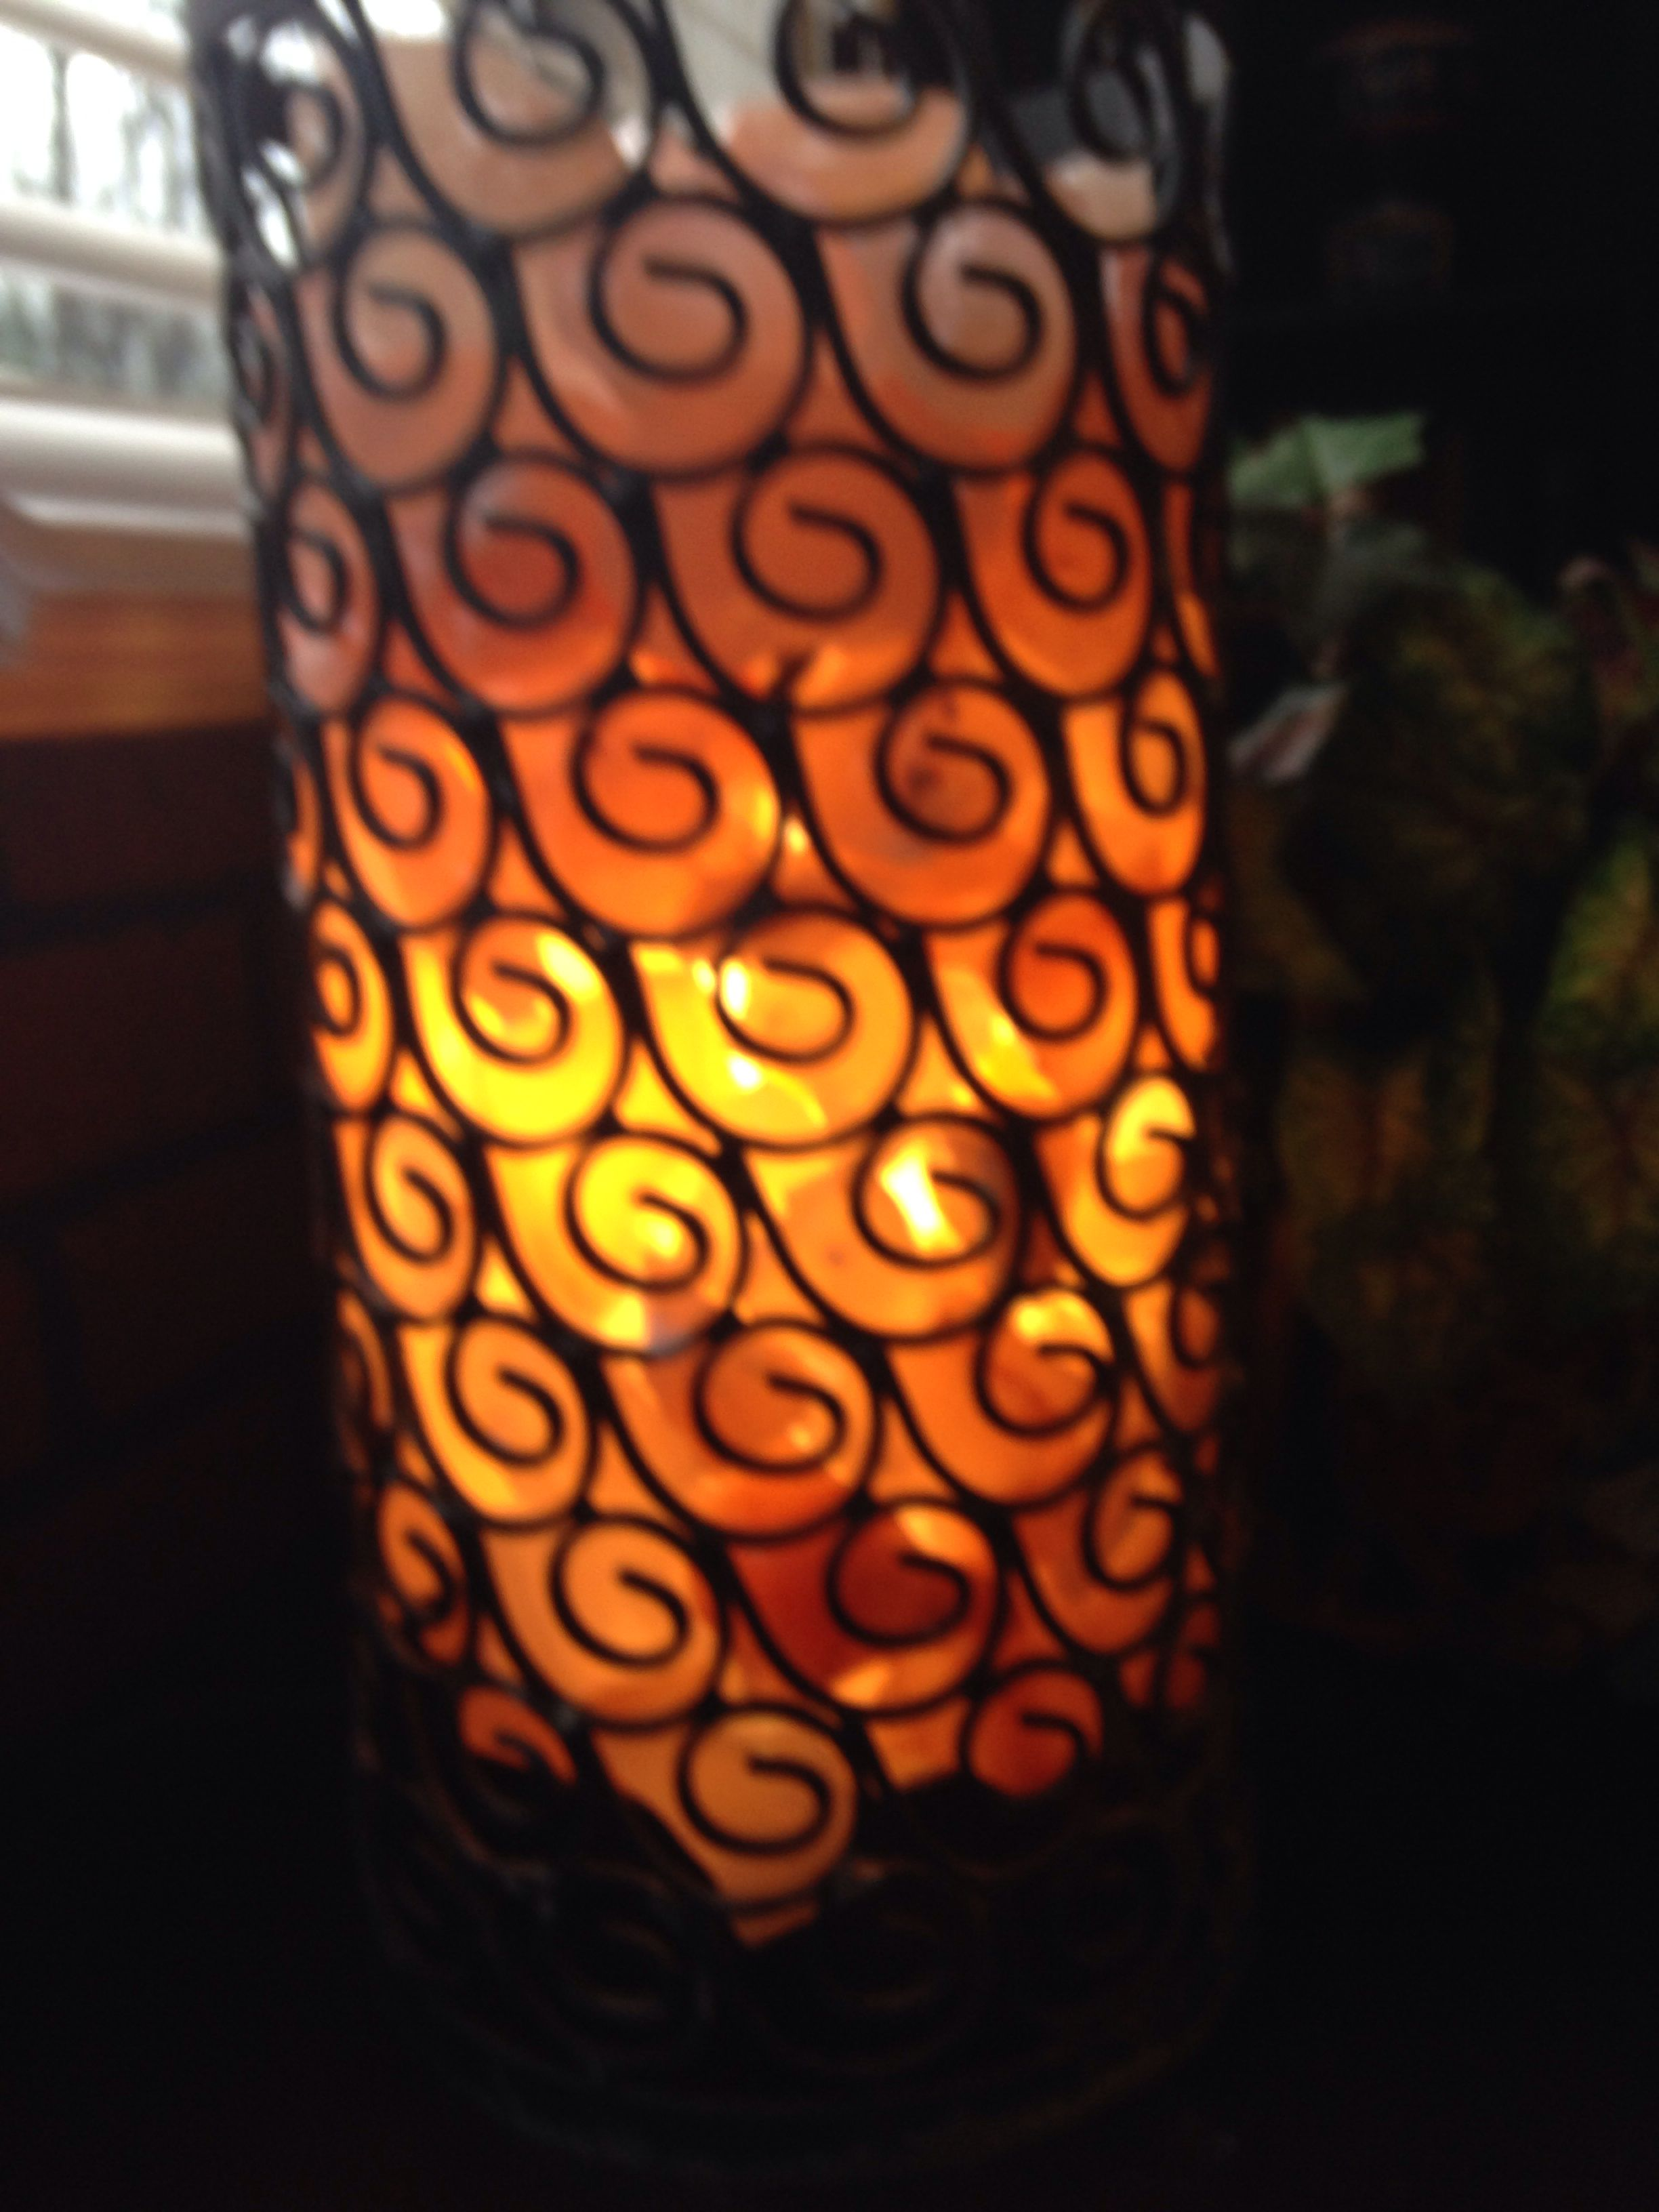 Glowing rockz